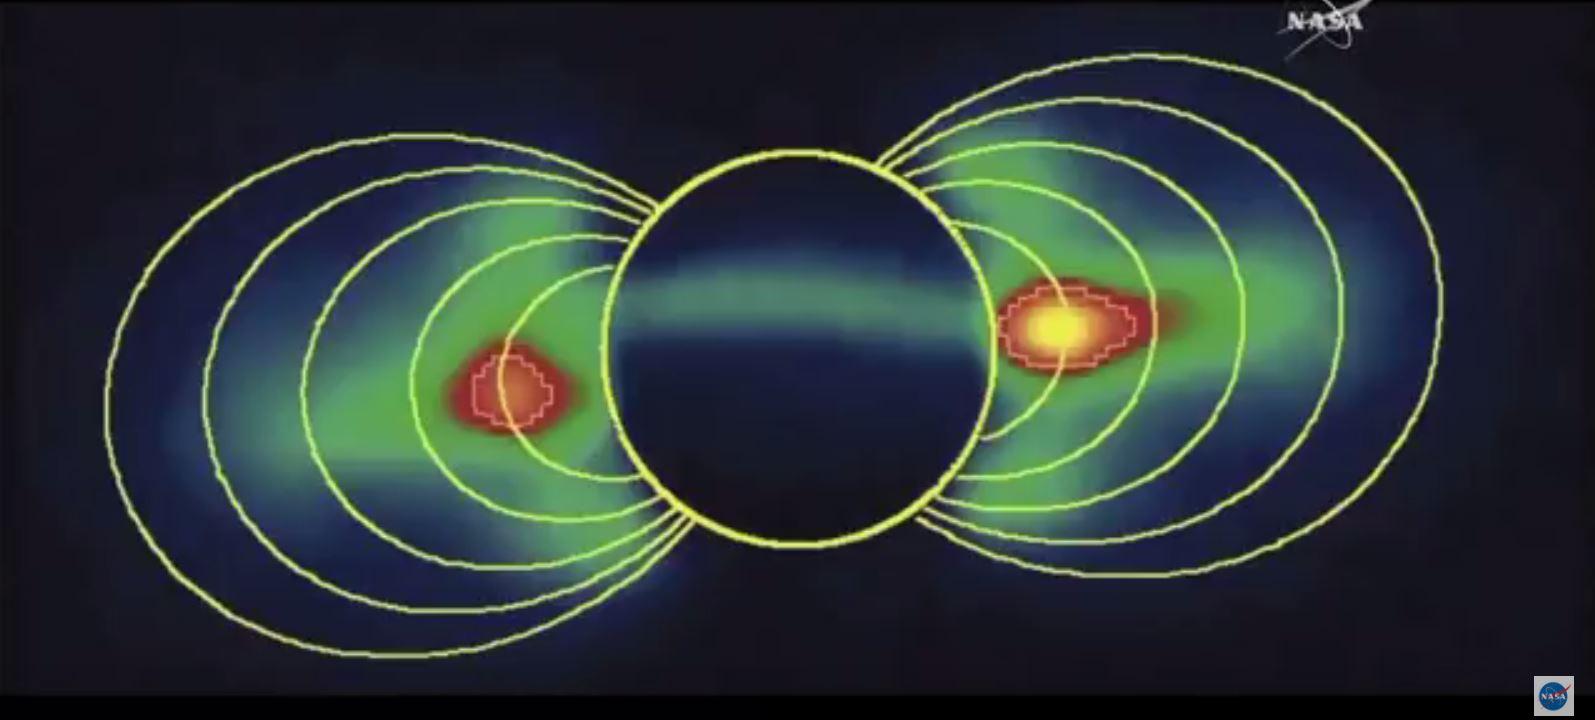 Jupiter's Radiation Belt